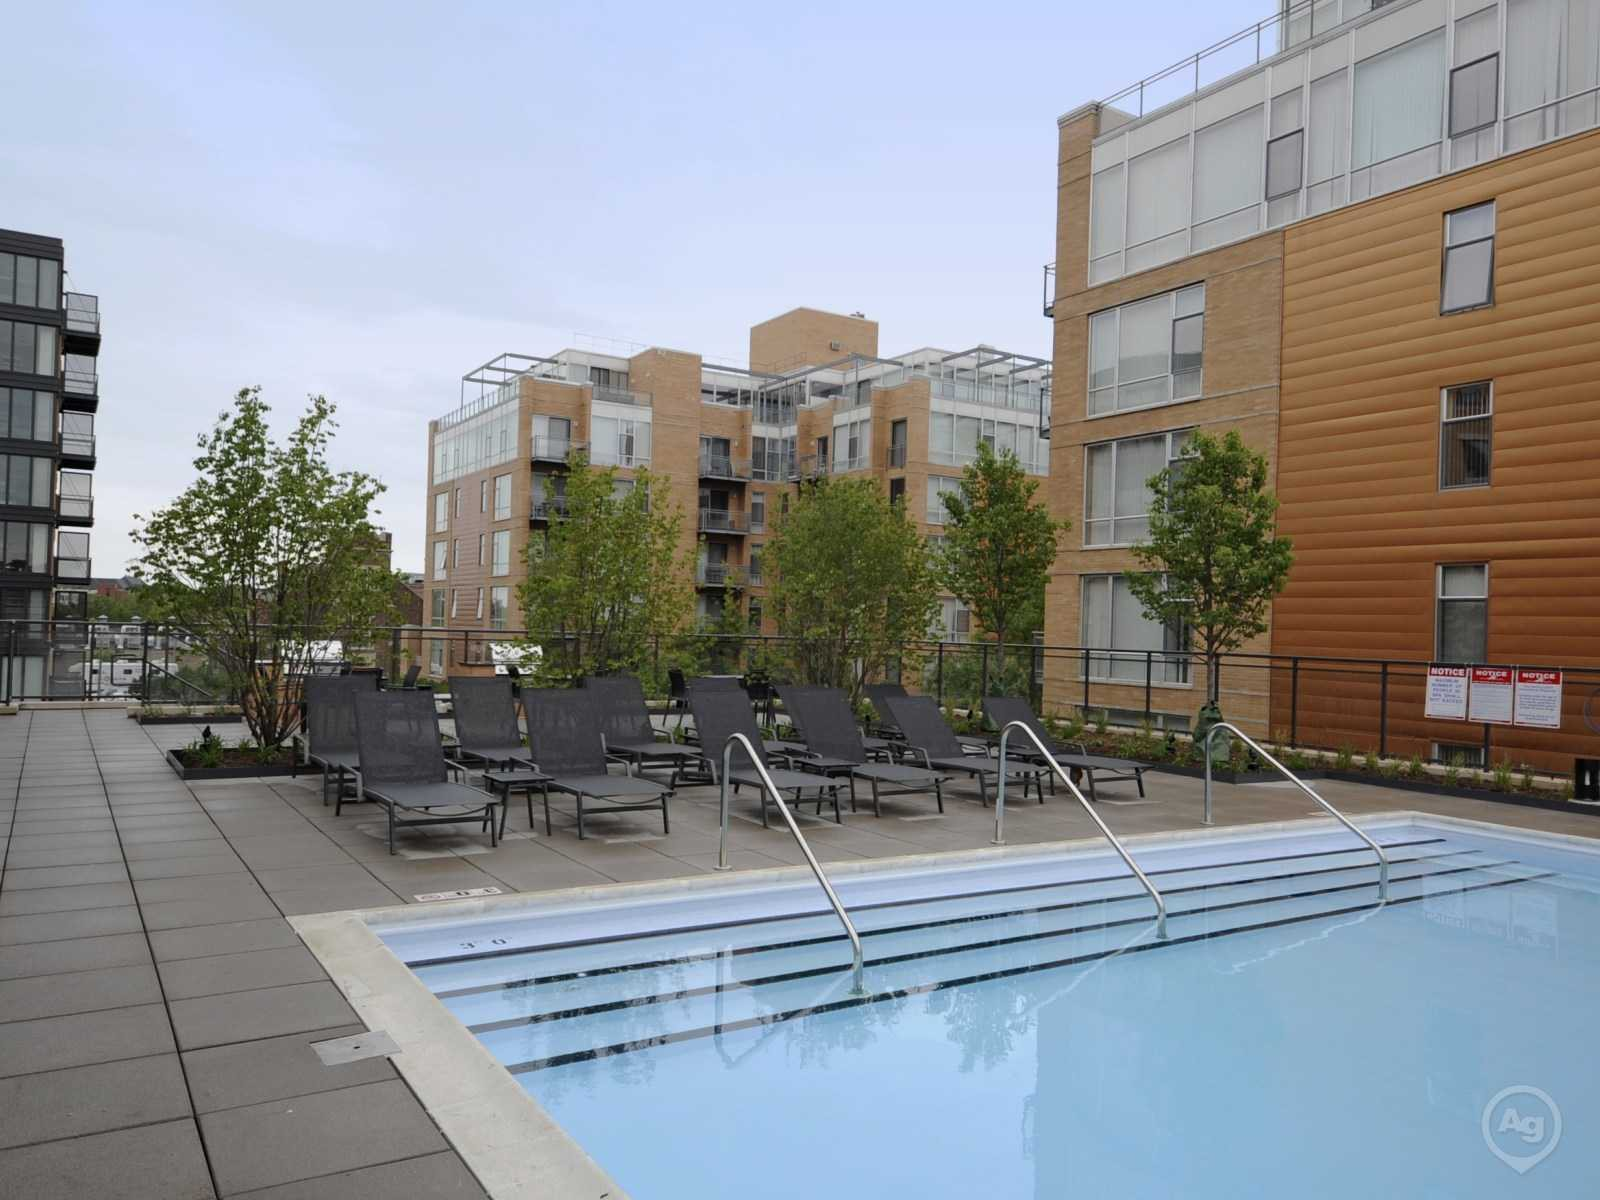 Evanston Place Apartments - 1715 Chicago Ave, Evanston, IL 60201 ...